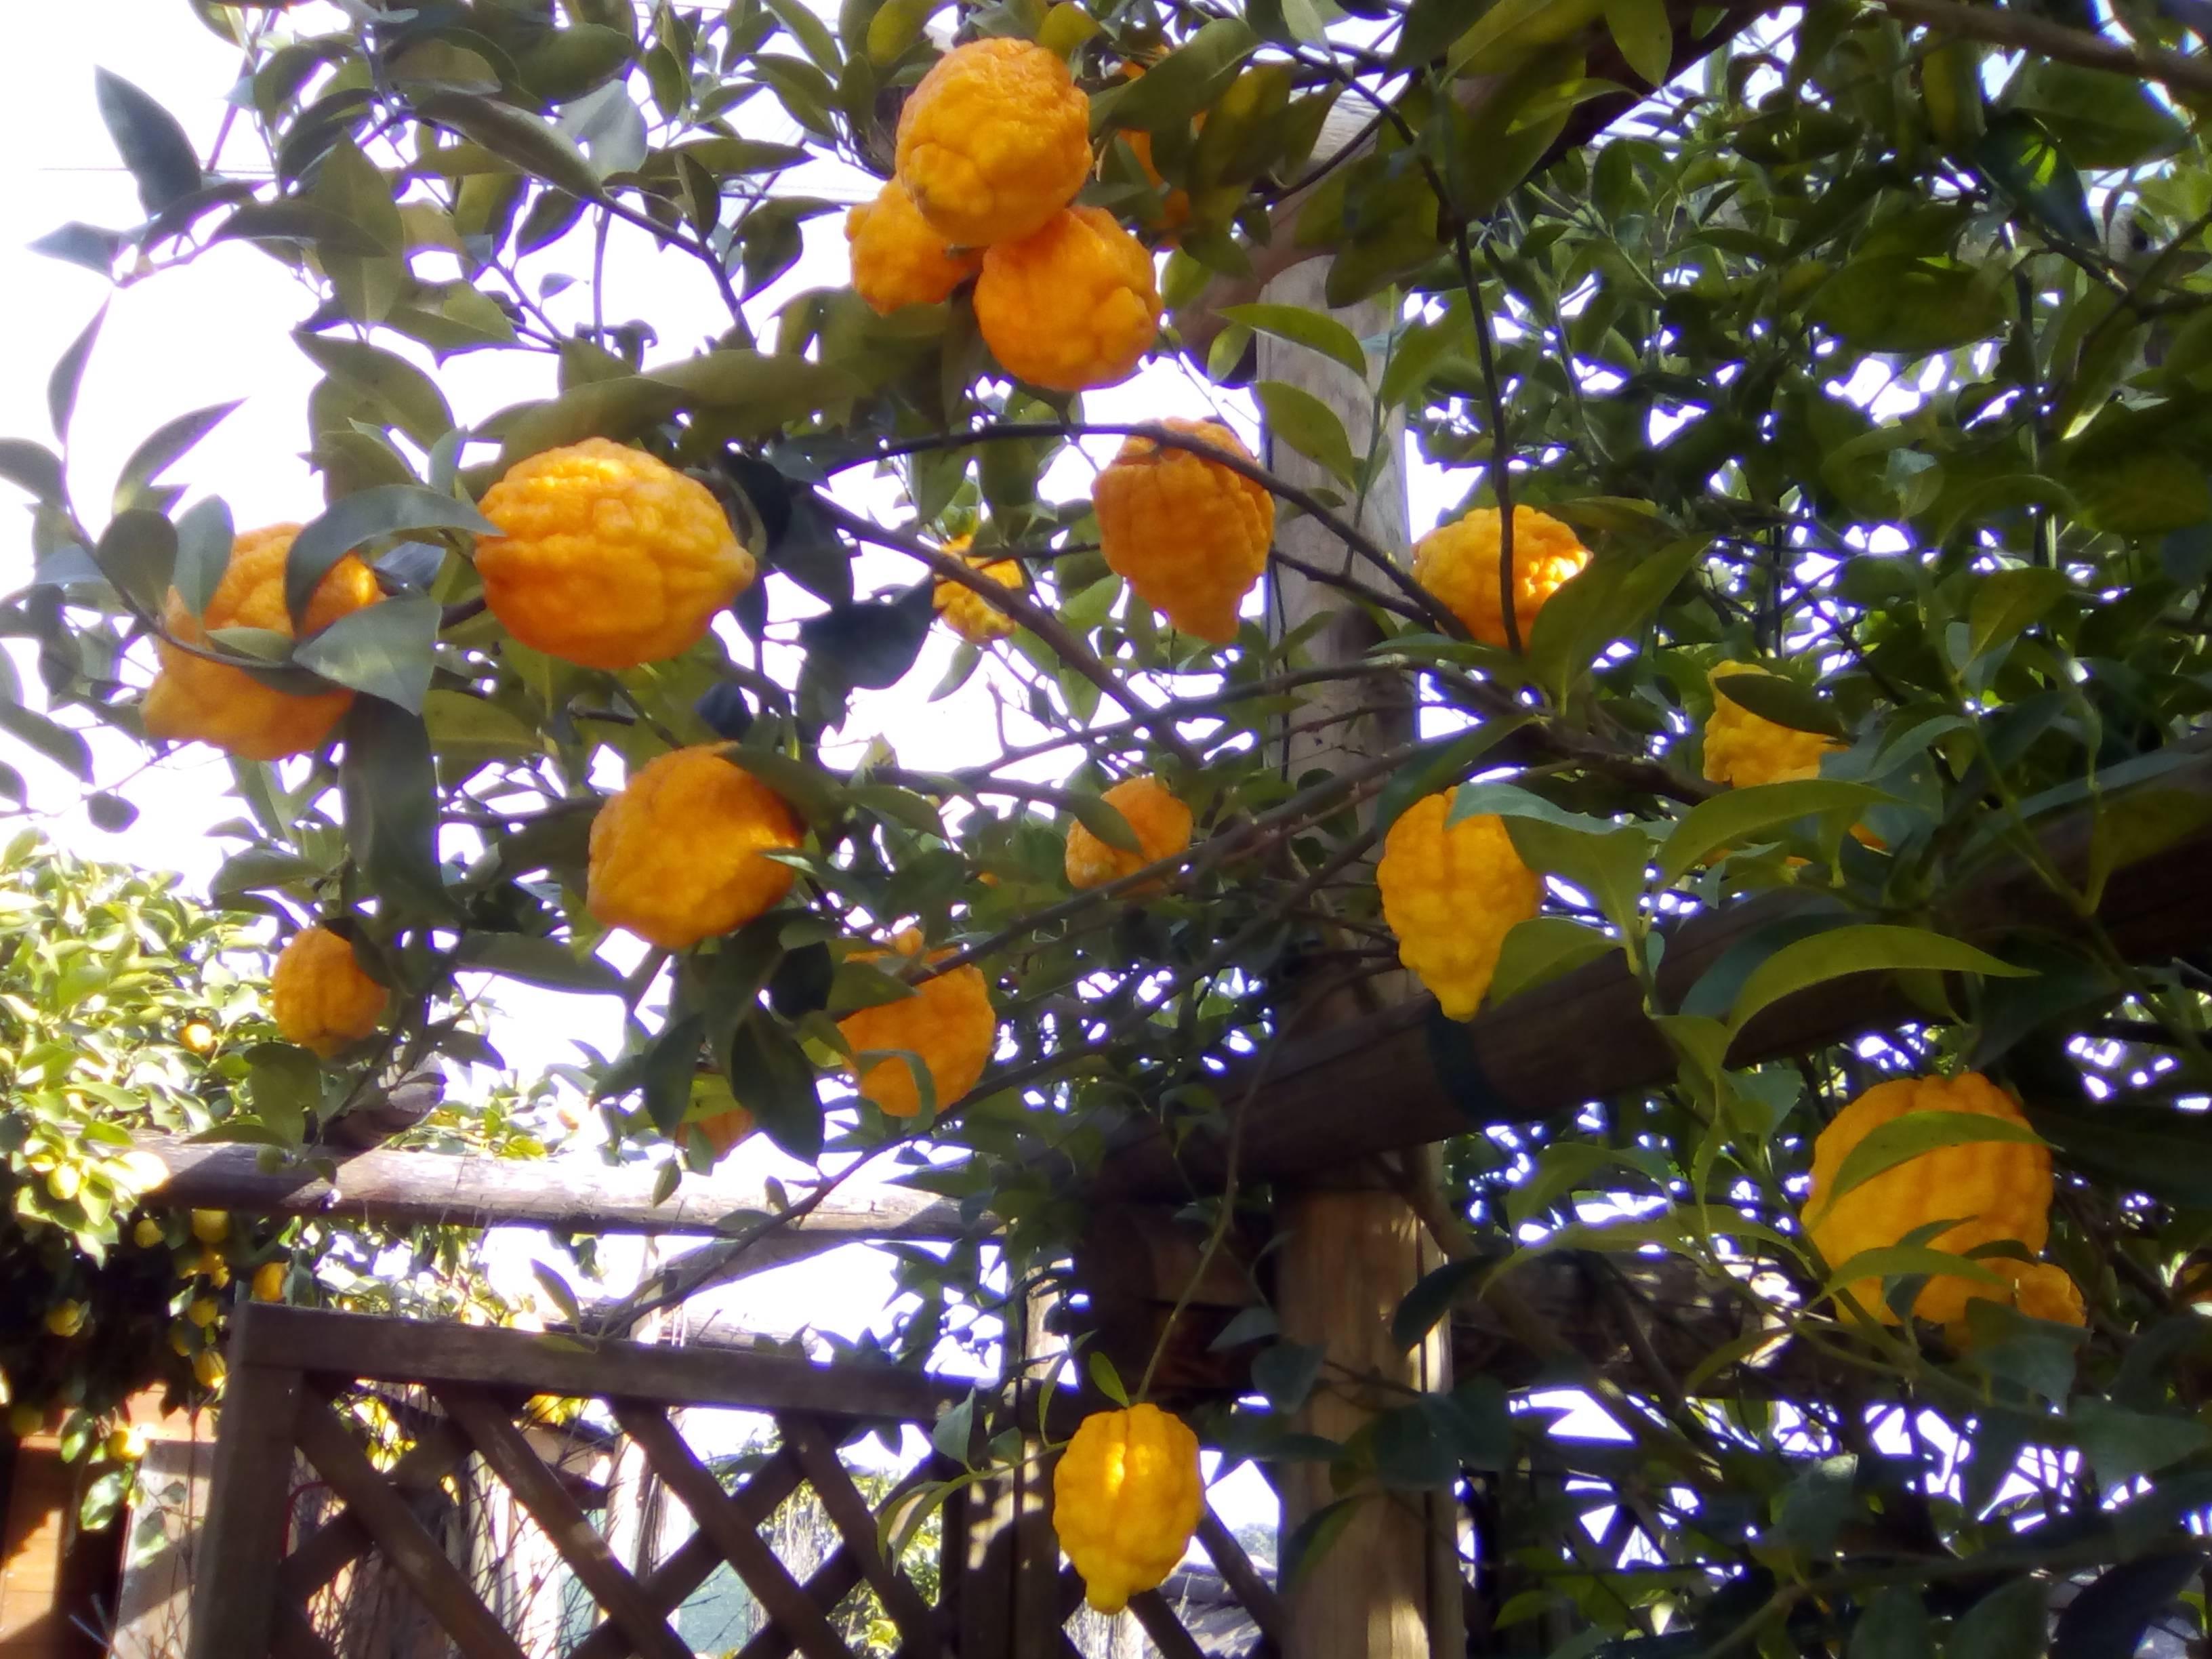 Citrus fruits of Cannero Riviera (VB)